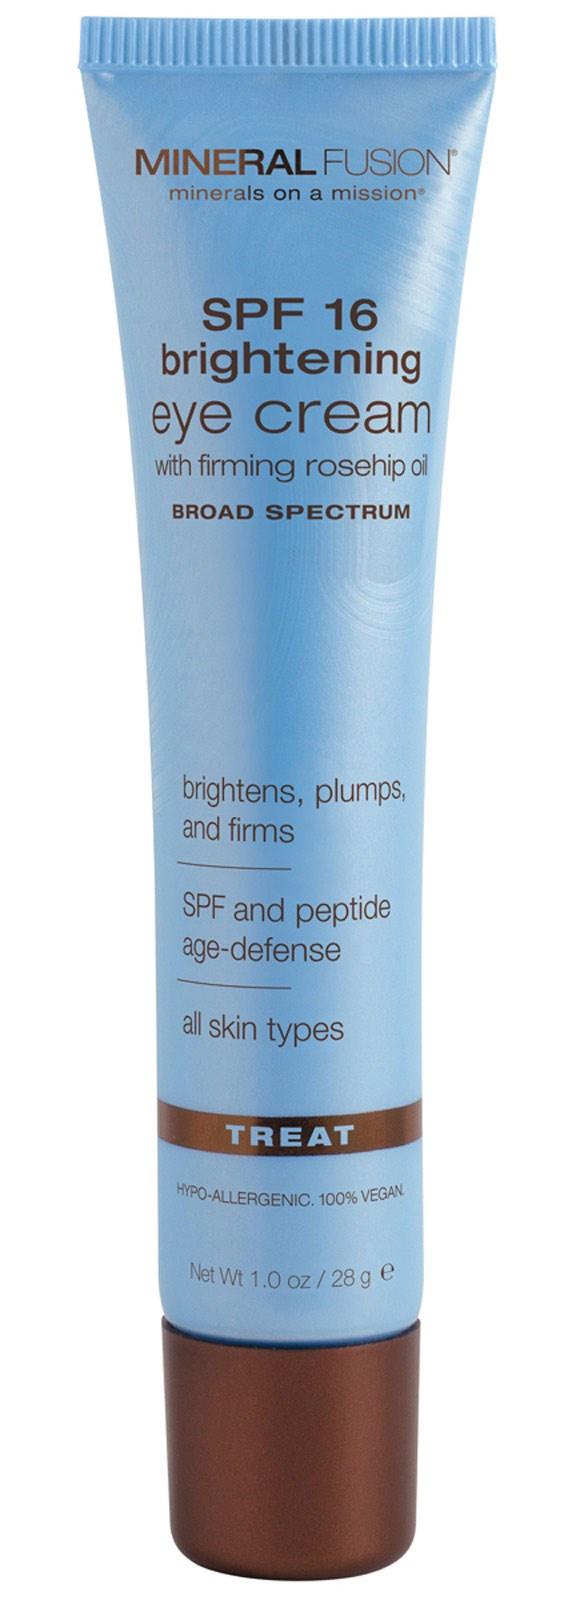 Mineral Fusion SPF 16 Brightening Eye Cream